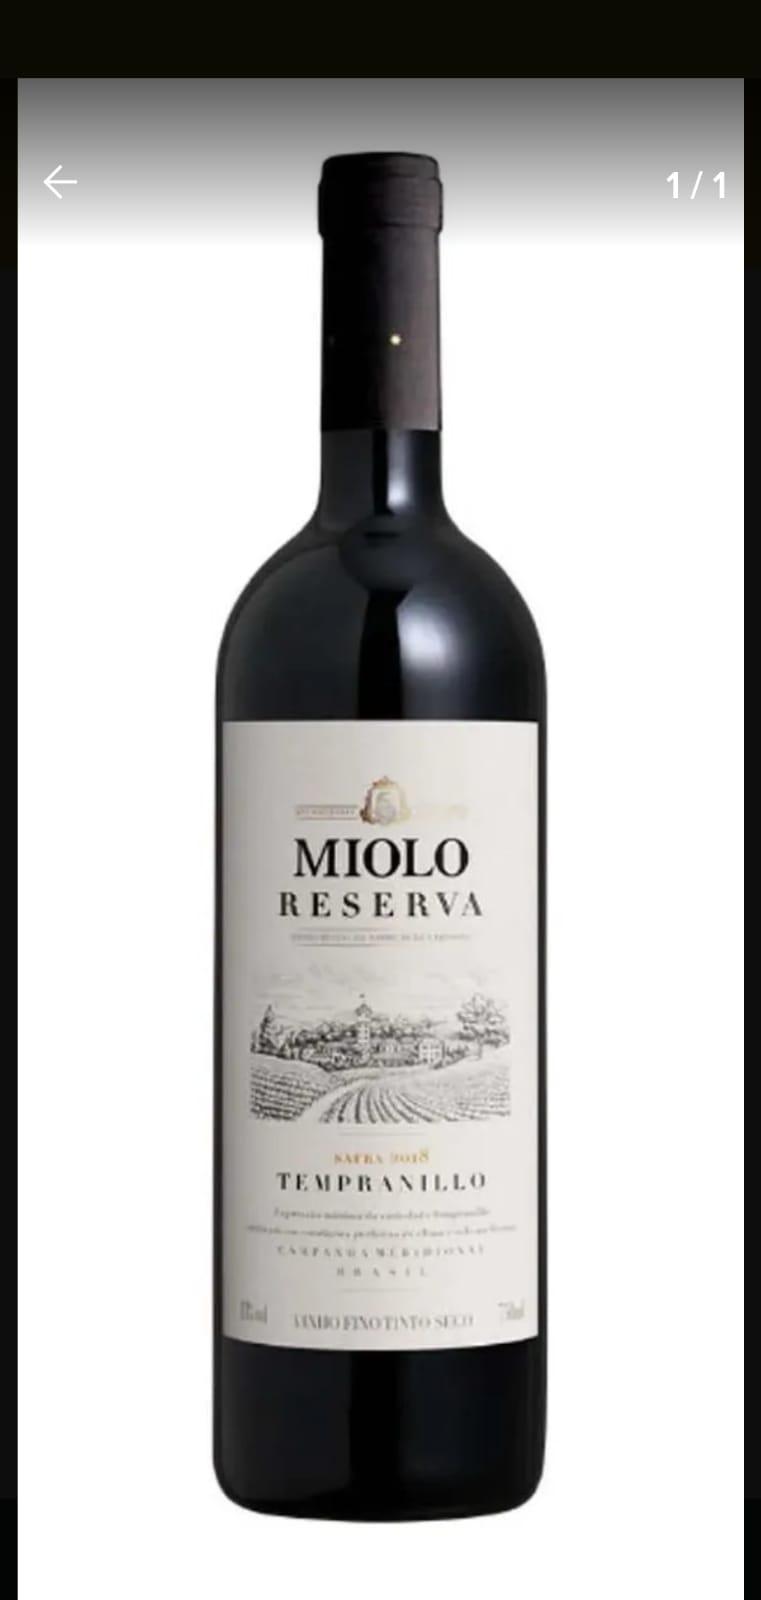 Vinho Tinto Miolo Reserva Tempranillo